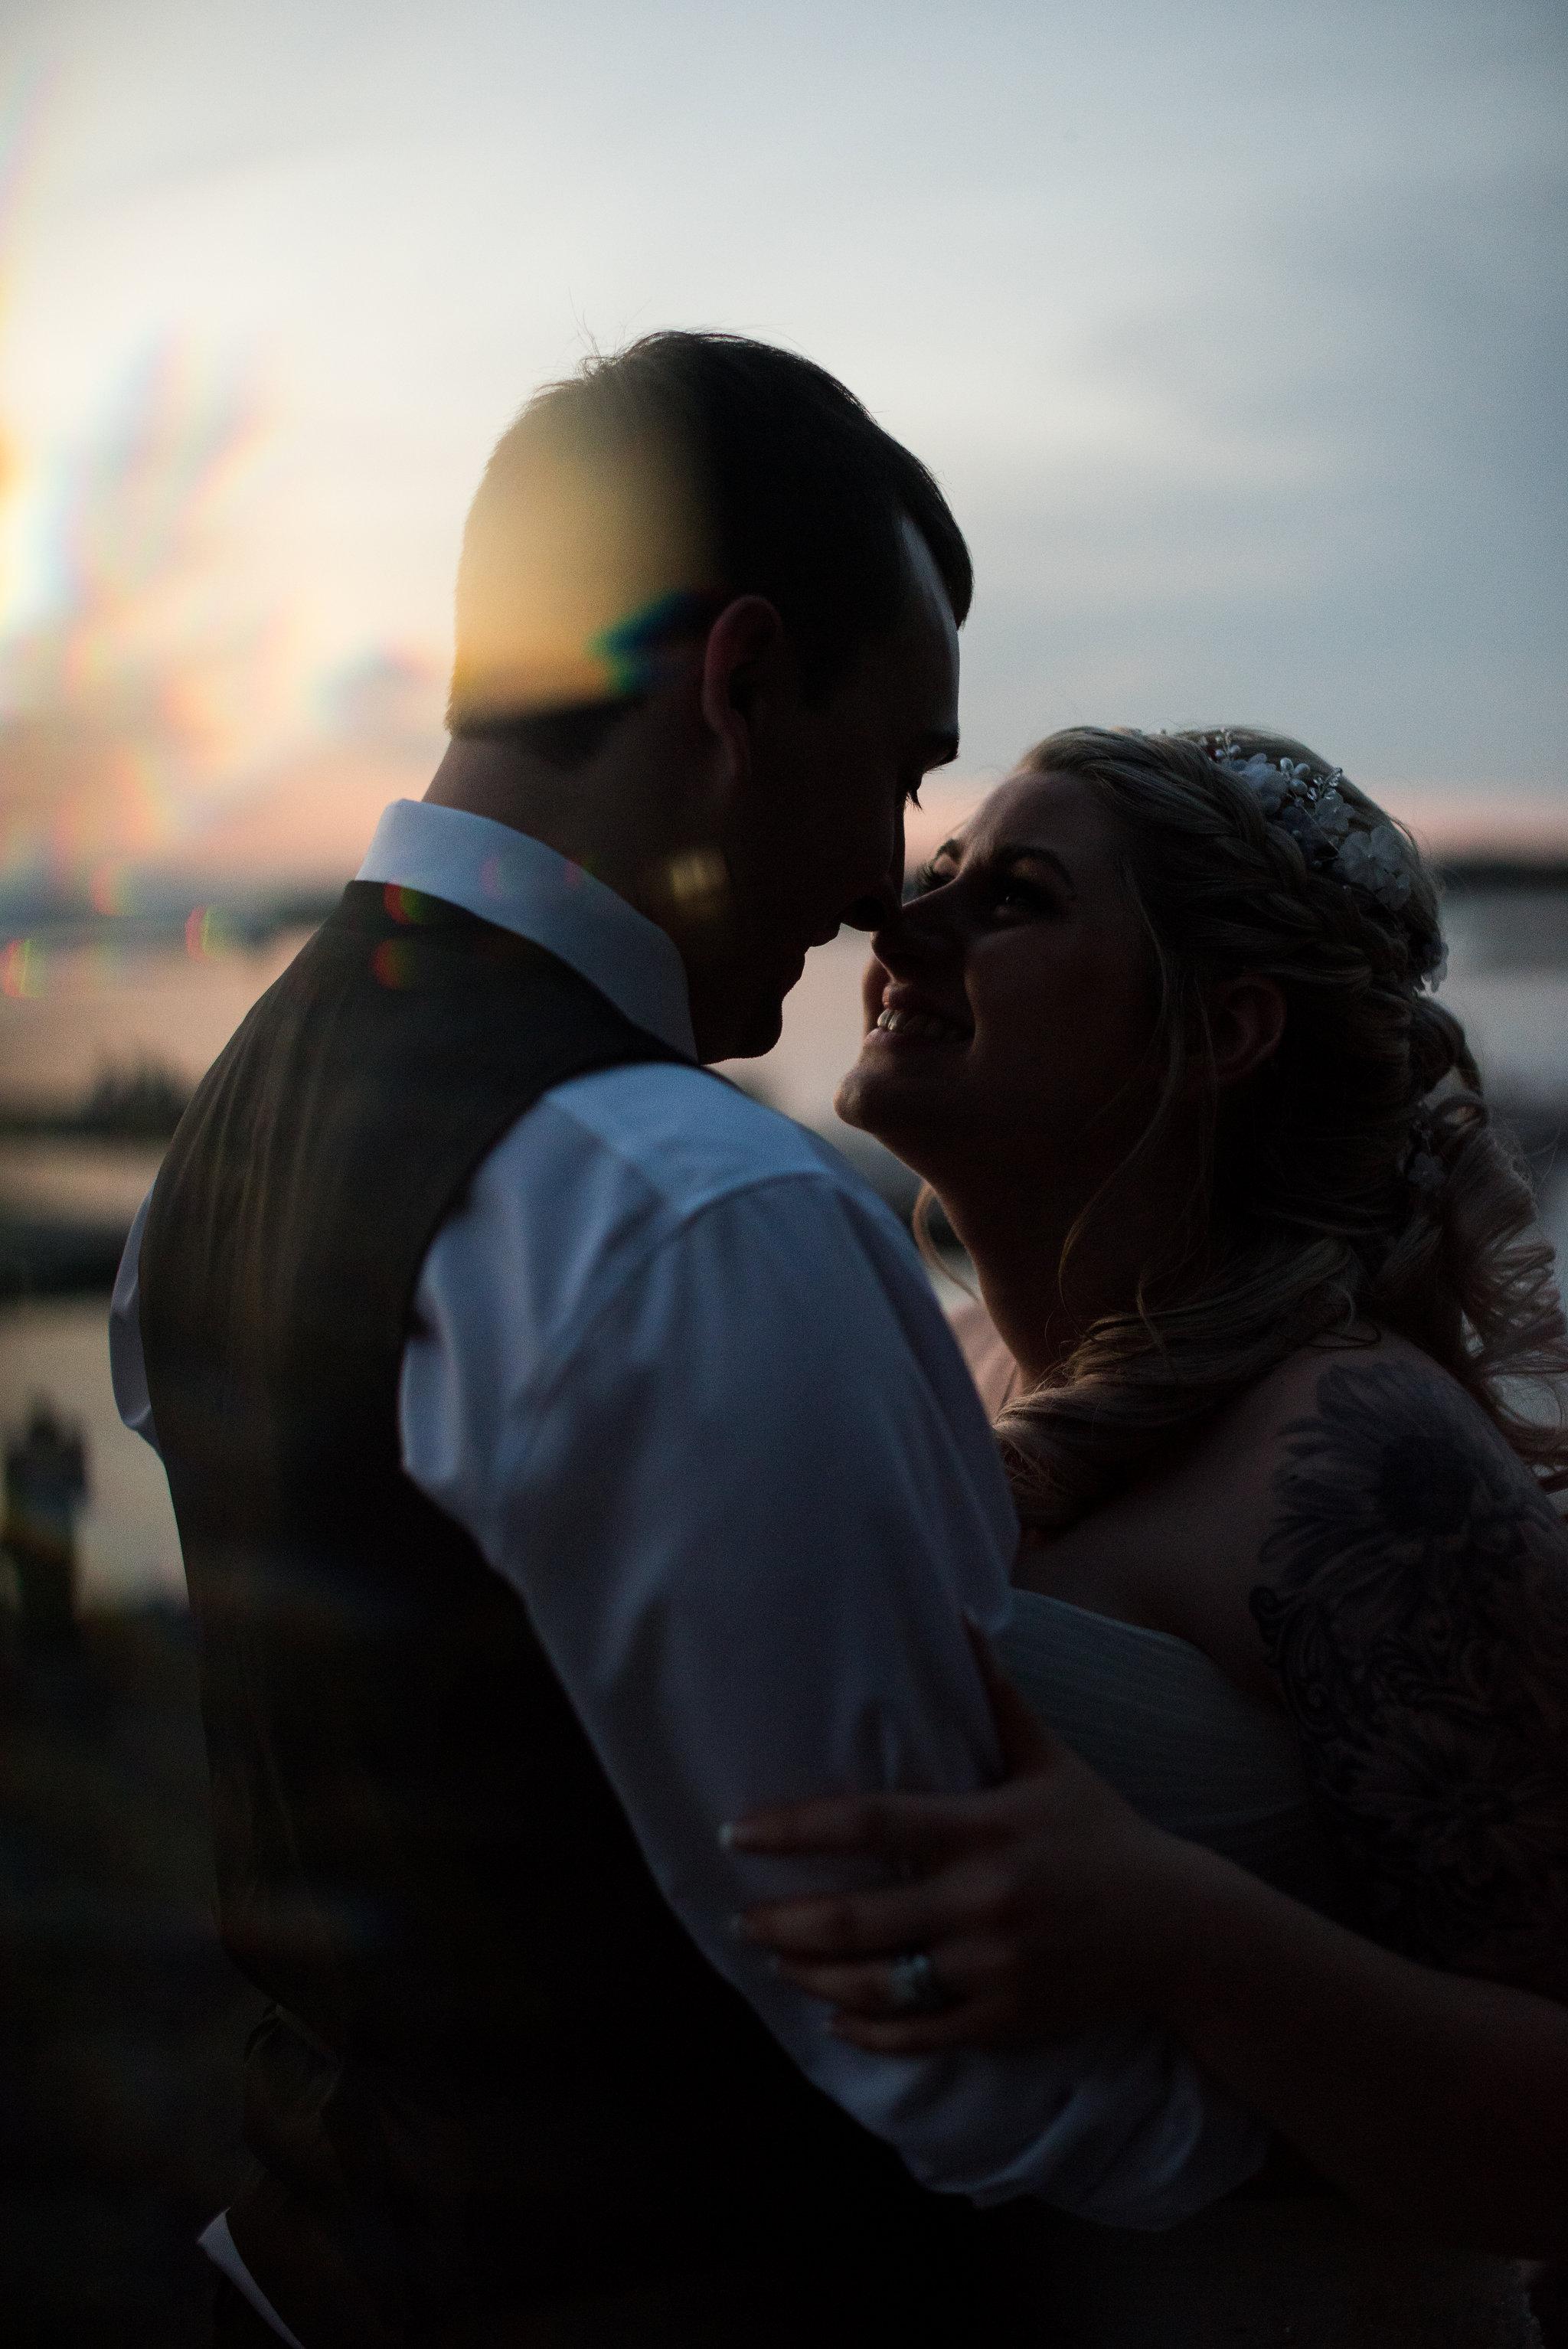 vermont-wedding-photographer-sarah-annay-photography.jpg7.jpg